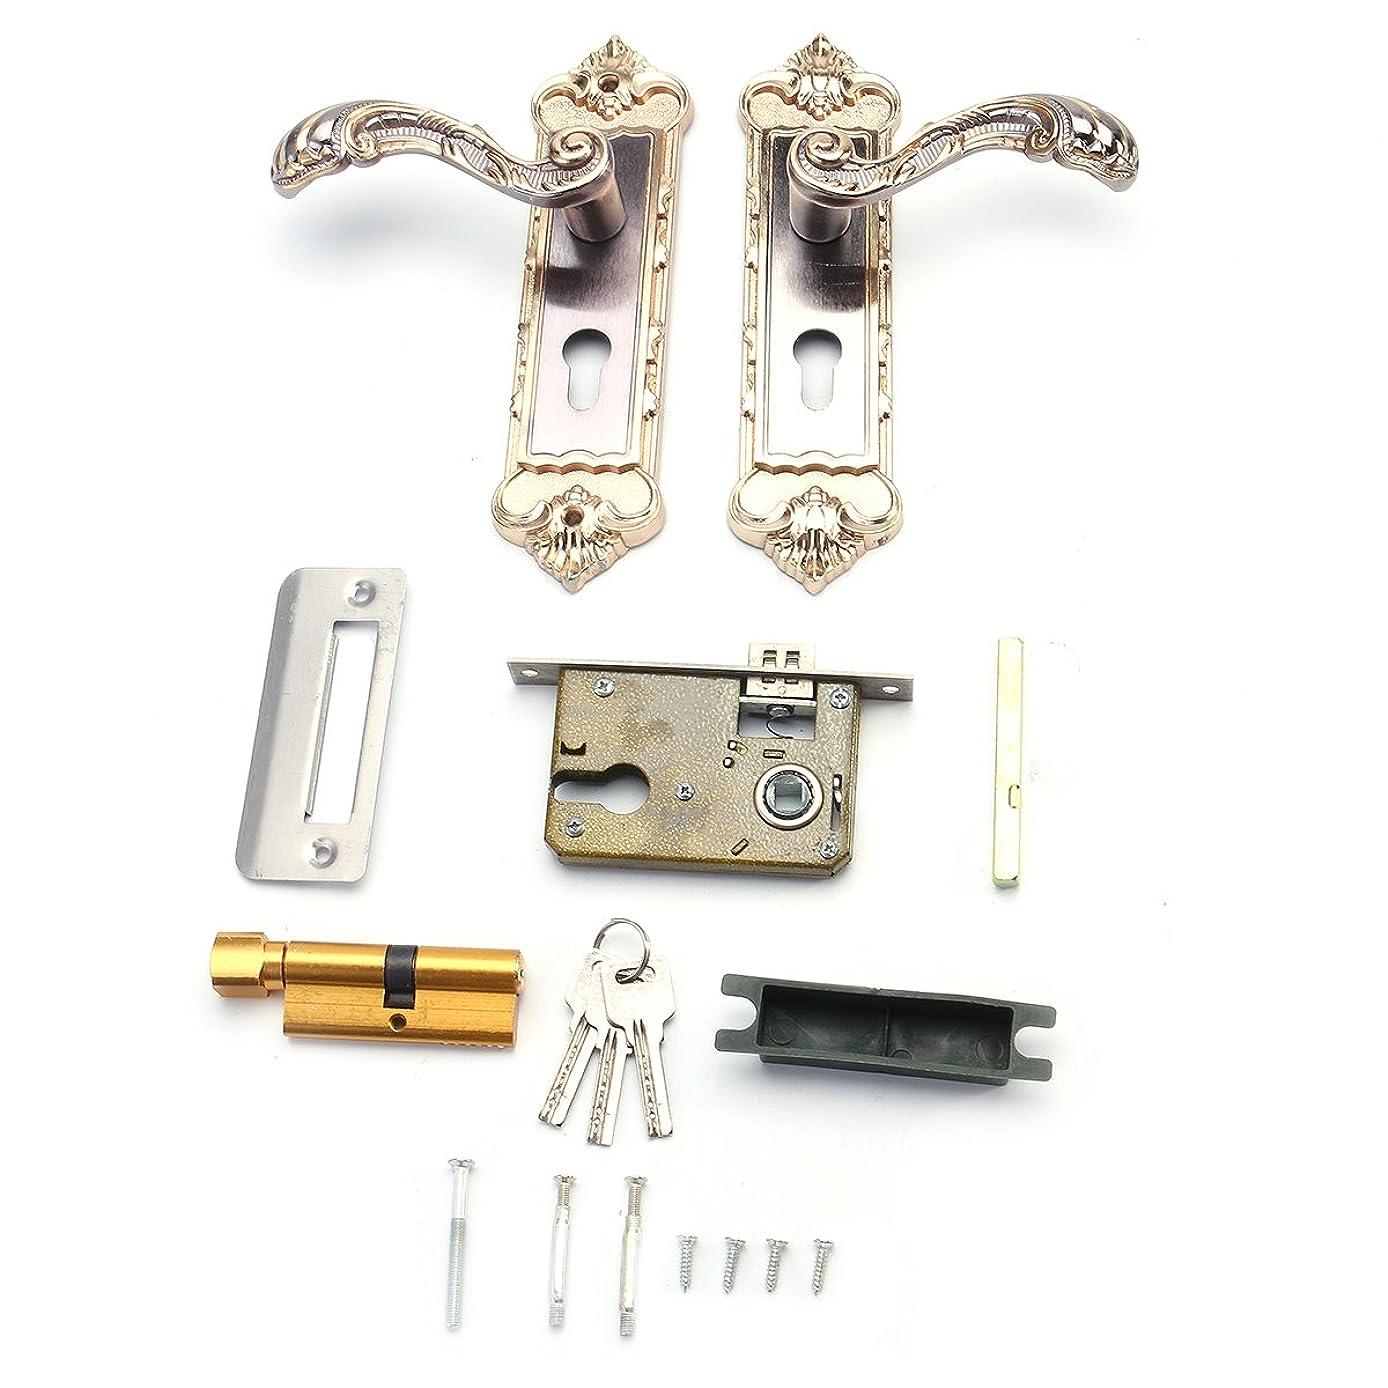 RISHIL WORLD Mechanical Interior Door Handle Cylinder Lock Lever Latch Home Security Set